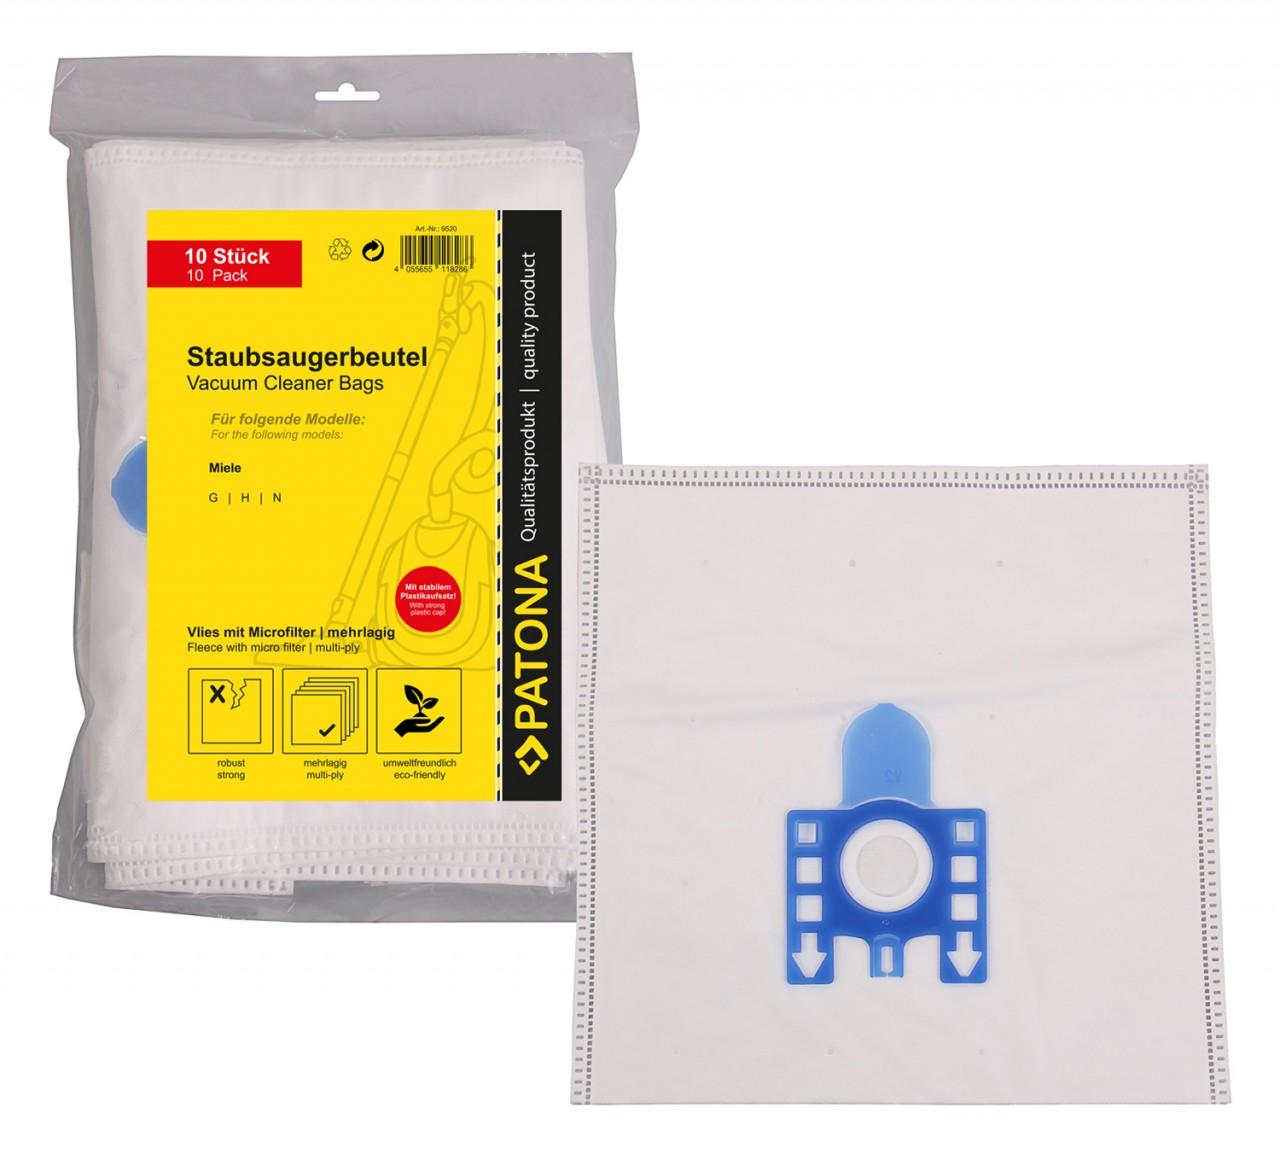 PATONA 10 STOFZUIGER bag multi layer fleece incl. Microfilte